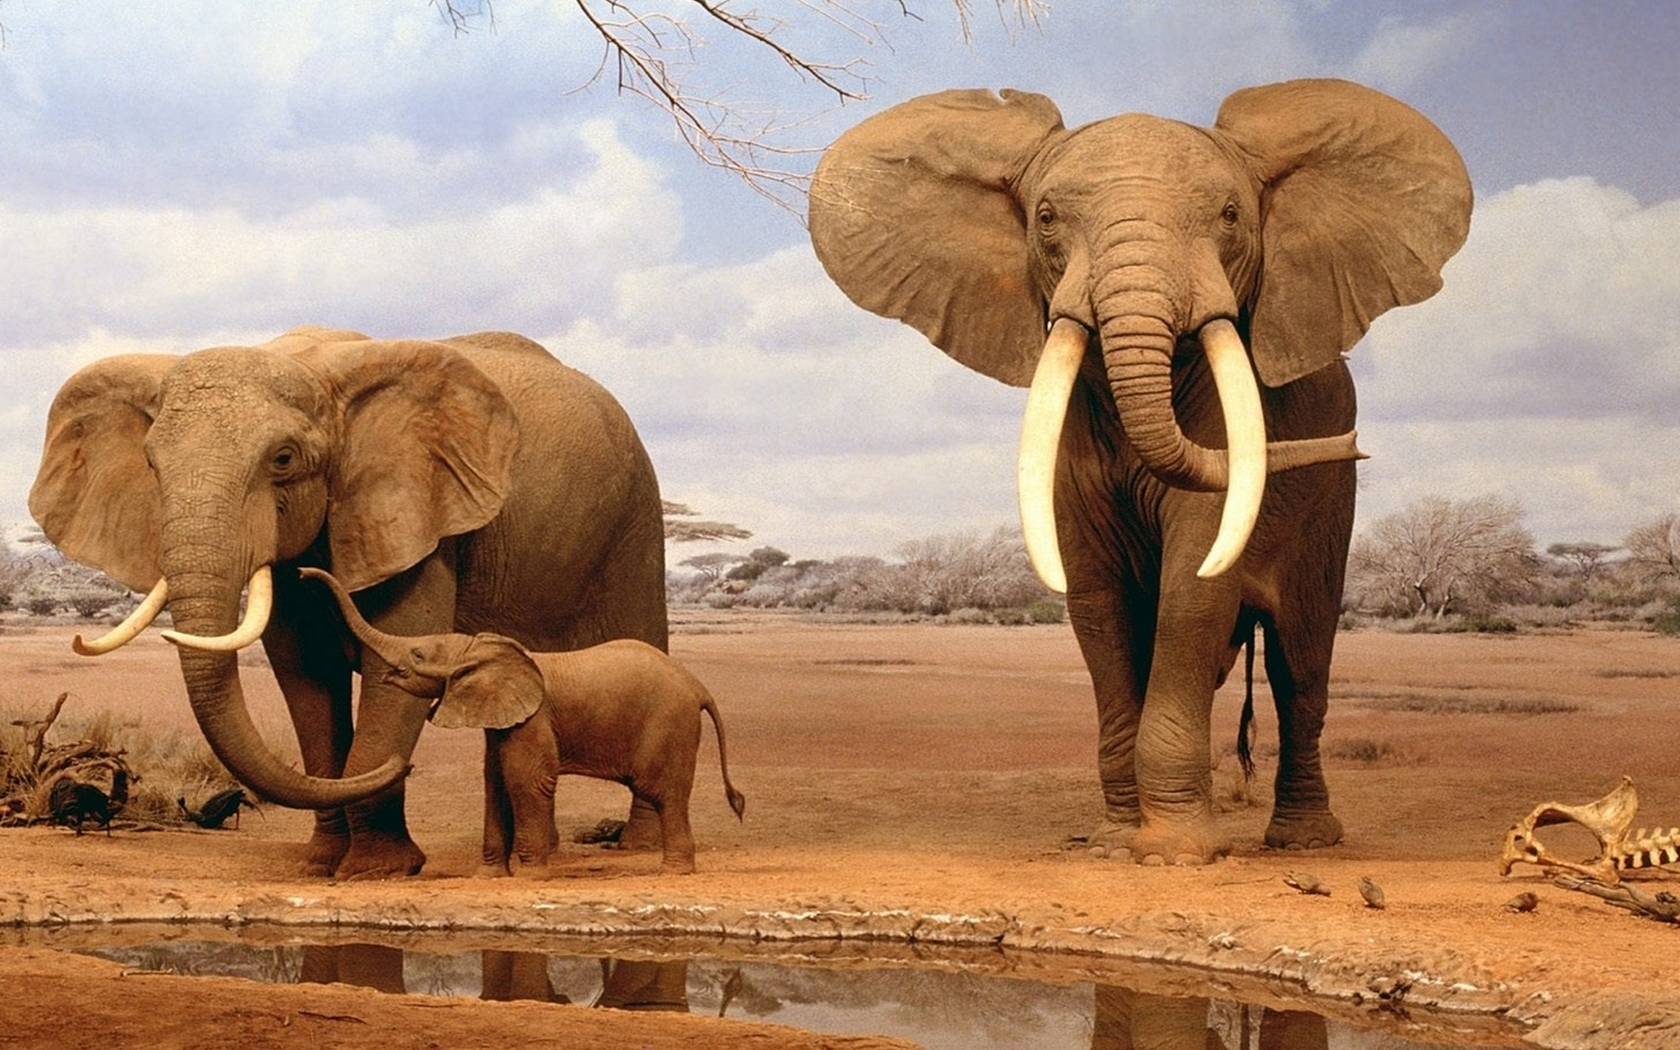 Familia de Elefantes - 1680x1050